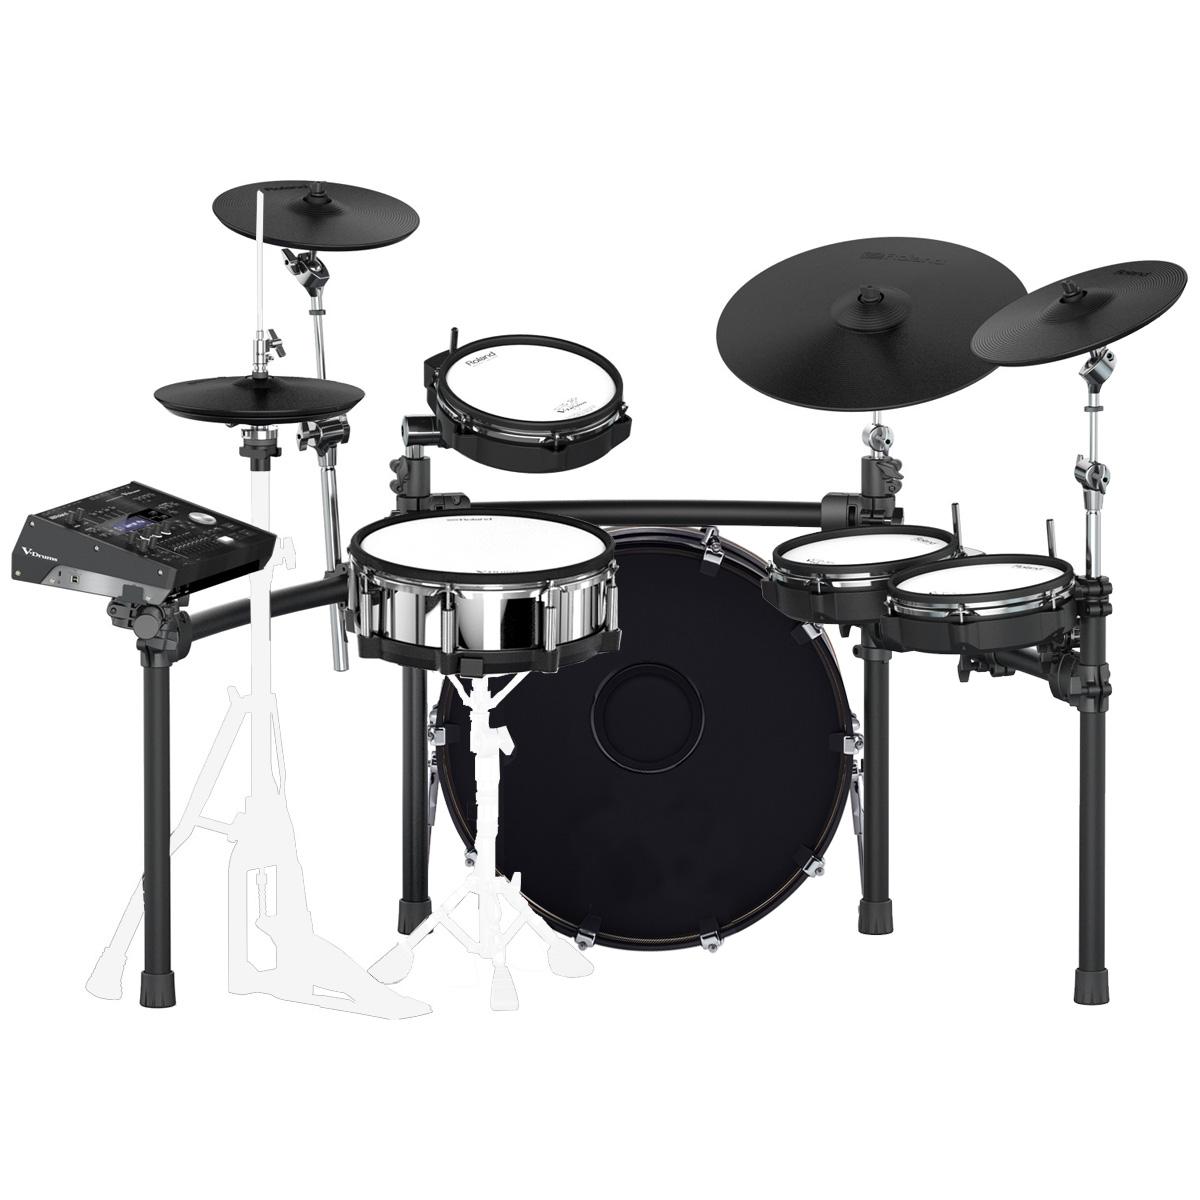 【Rolandキャッシュバック10000円対象】Roland Drum System TD-50K カスタム VH-13ハイハット KD-220 MDS-50K【YRK】